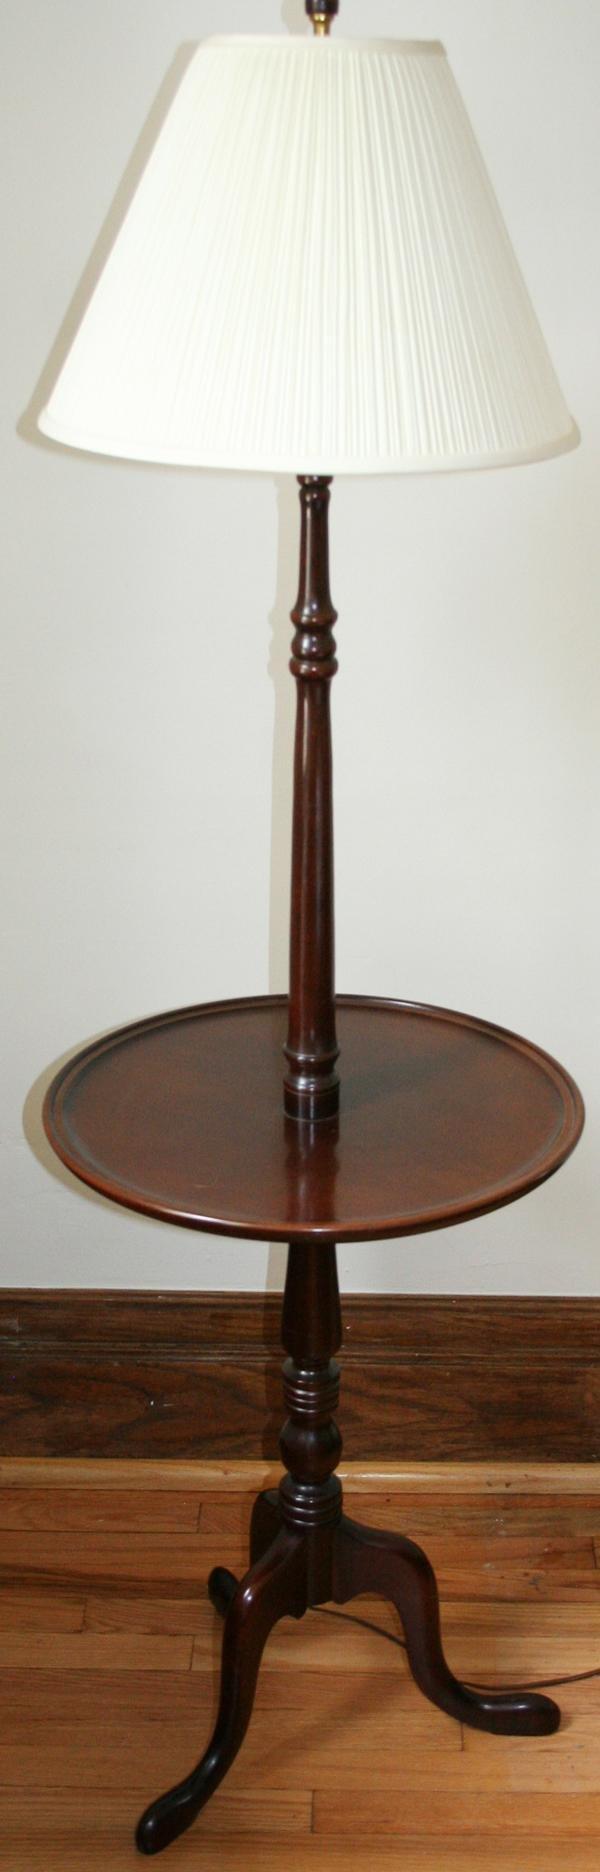 Merveilleux 080143: QUEEN ANN STYLE MAHOGANY COMBO TABLE FLOOR LAMP